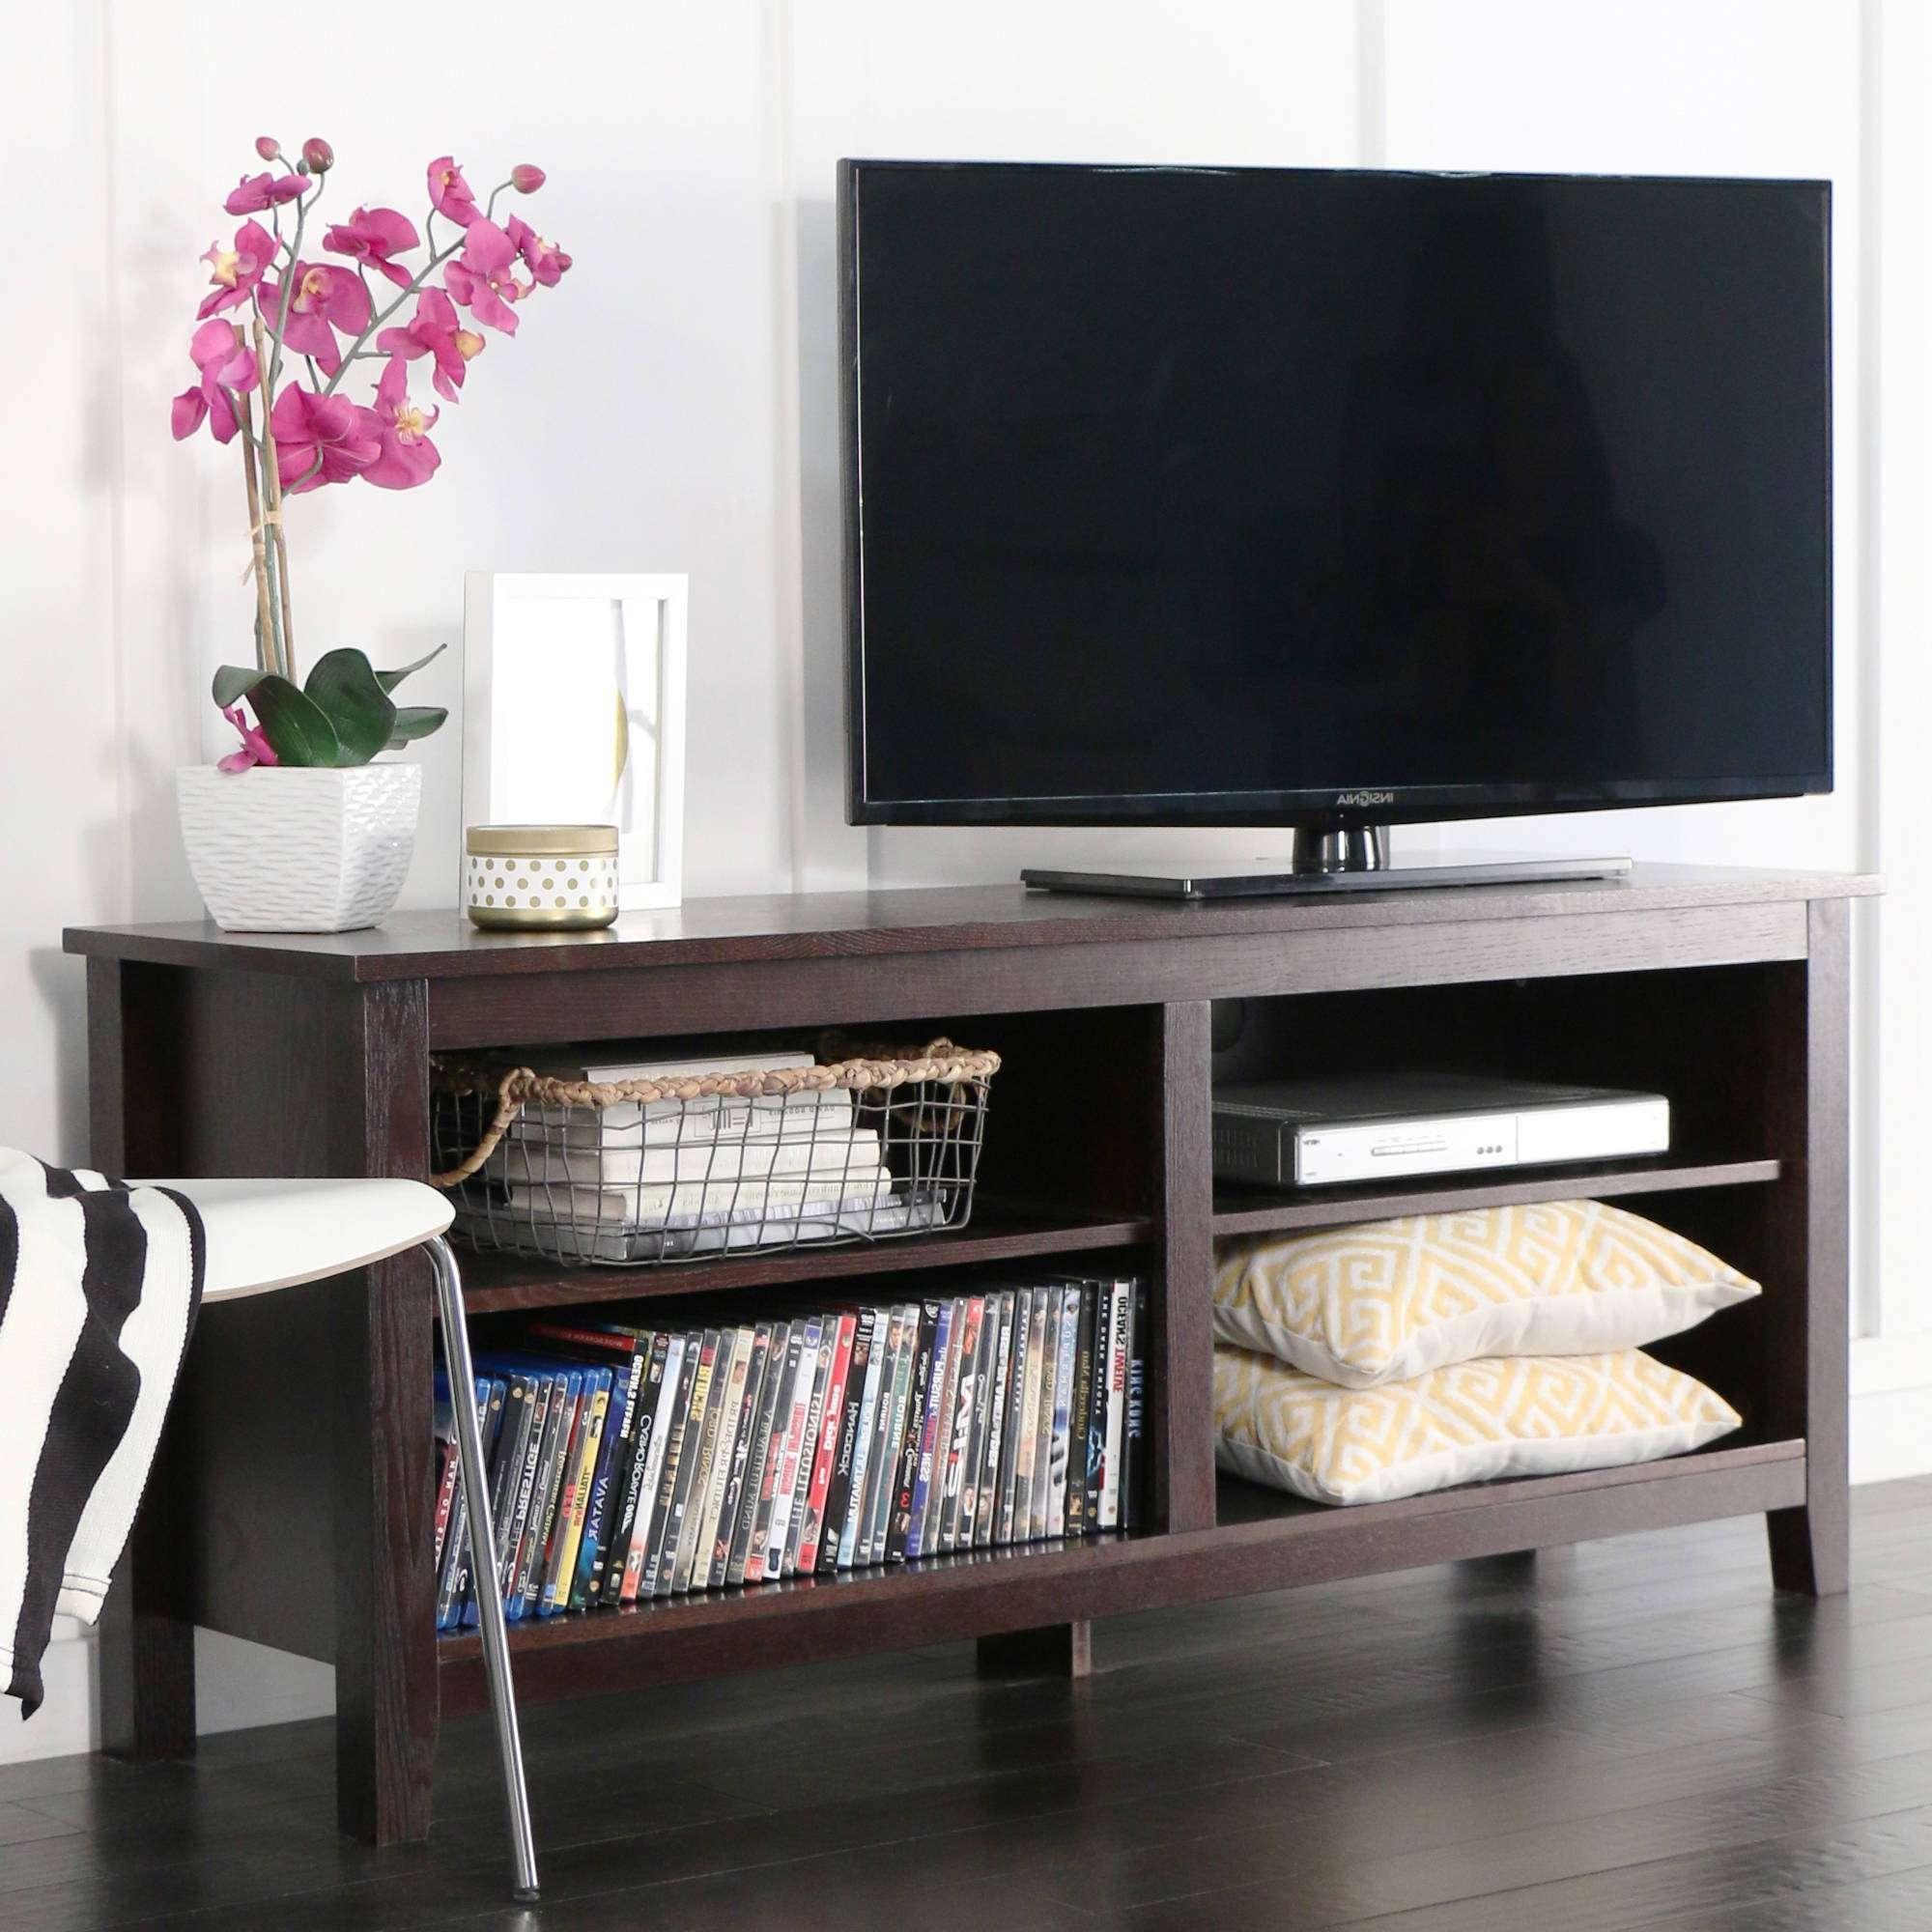 Tv : Rustic 60 Inch Tv Stands Dramatic Rustic 60 Inch Tv Stands For Rustic 60 Inch Tv Stands (View 8 of 15)